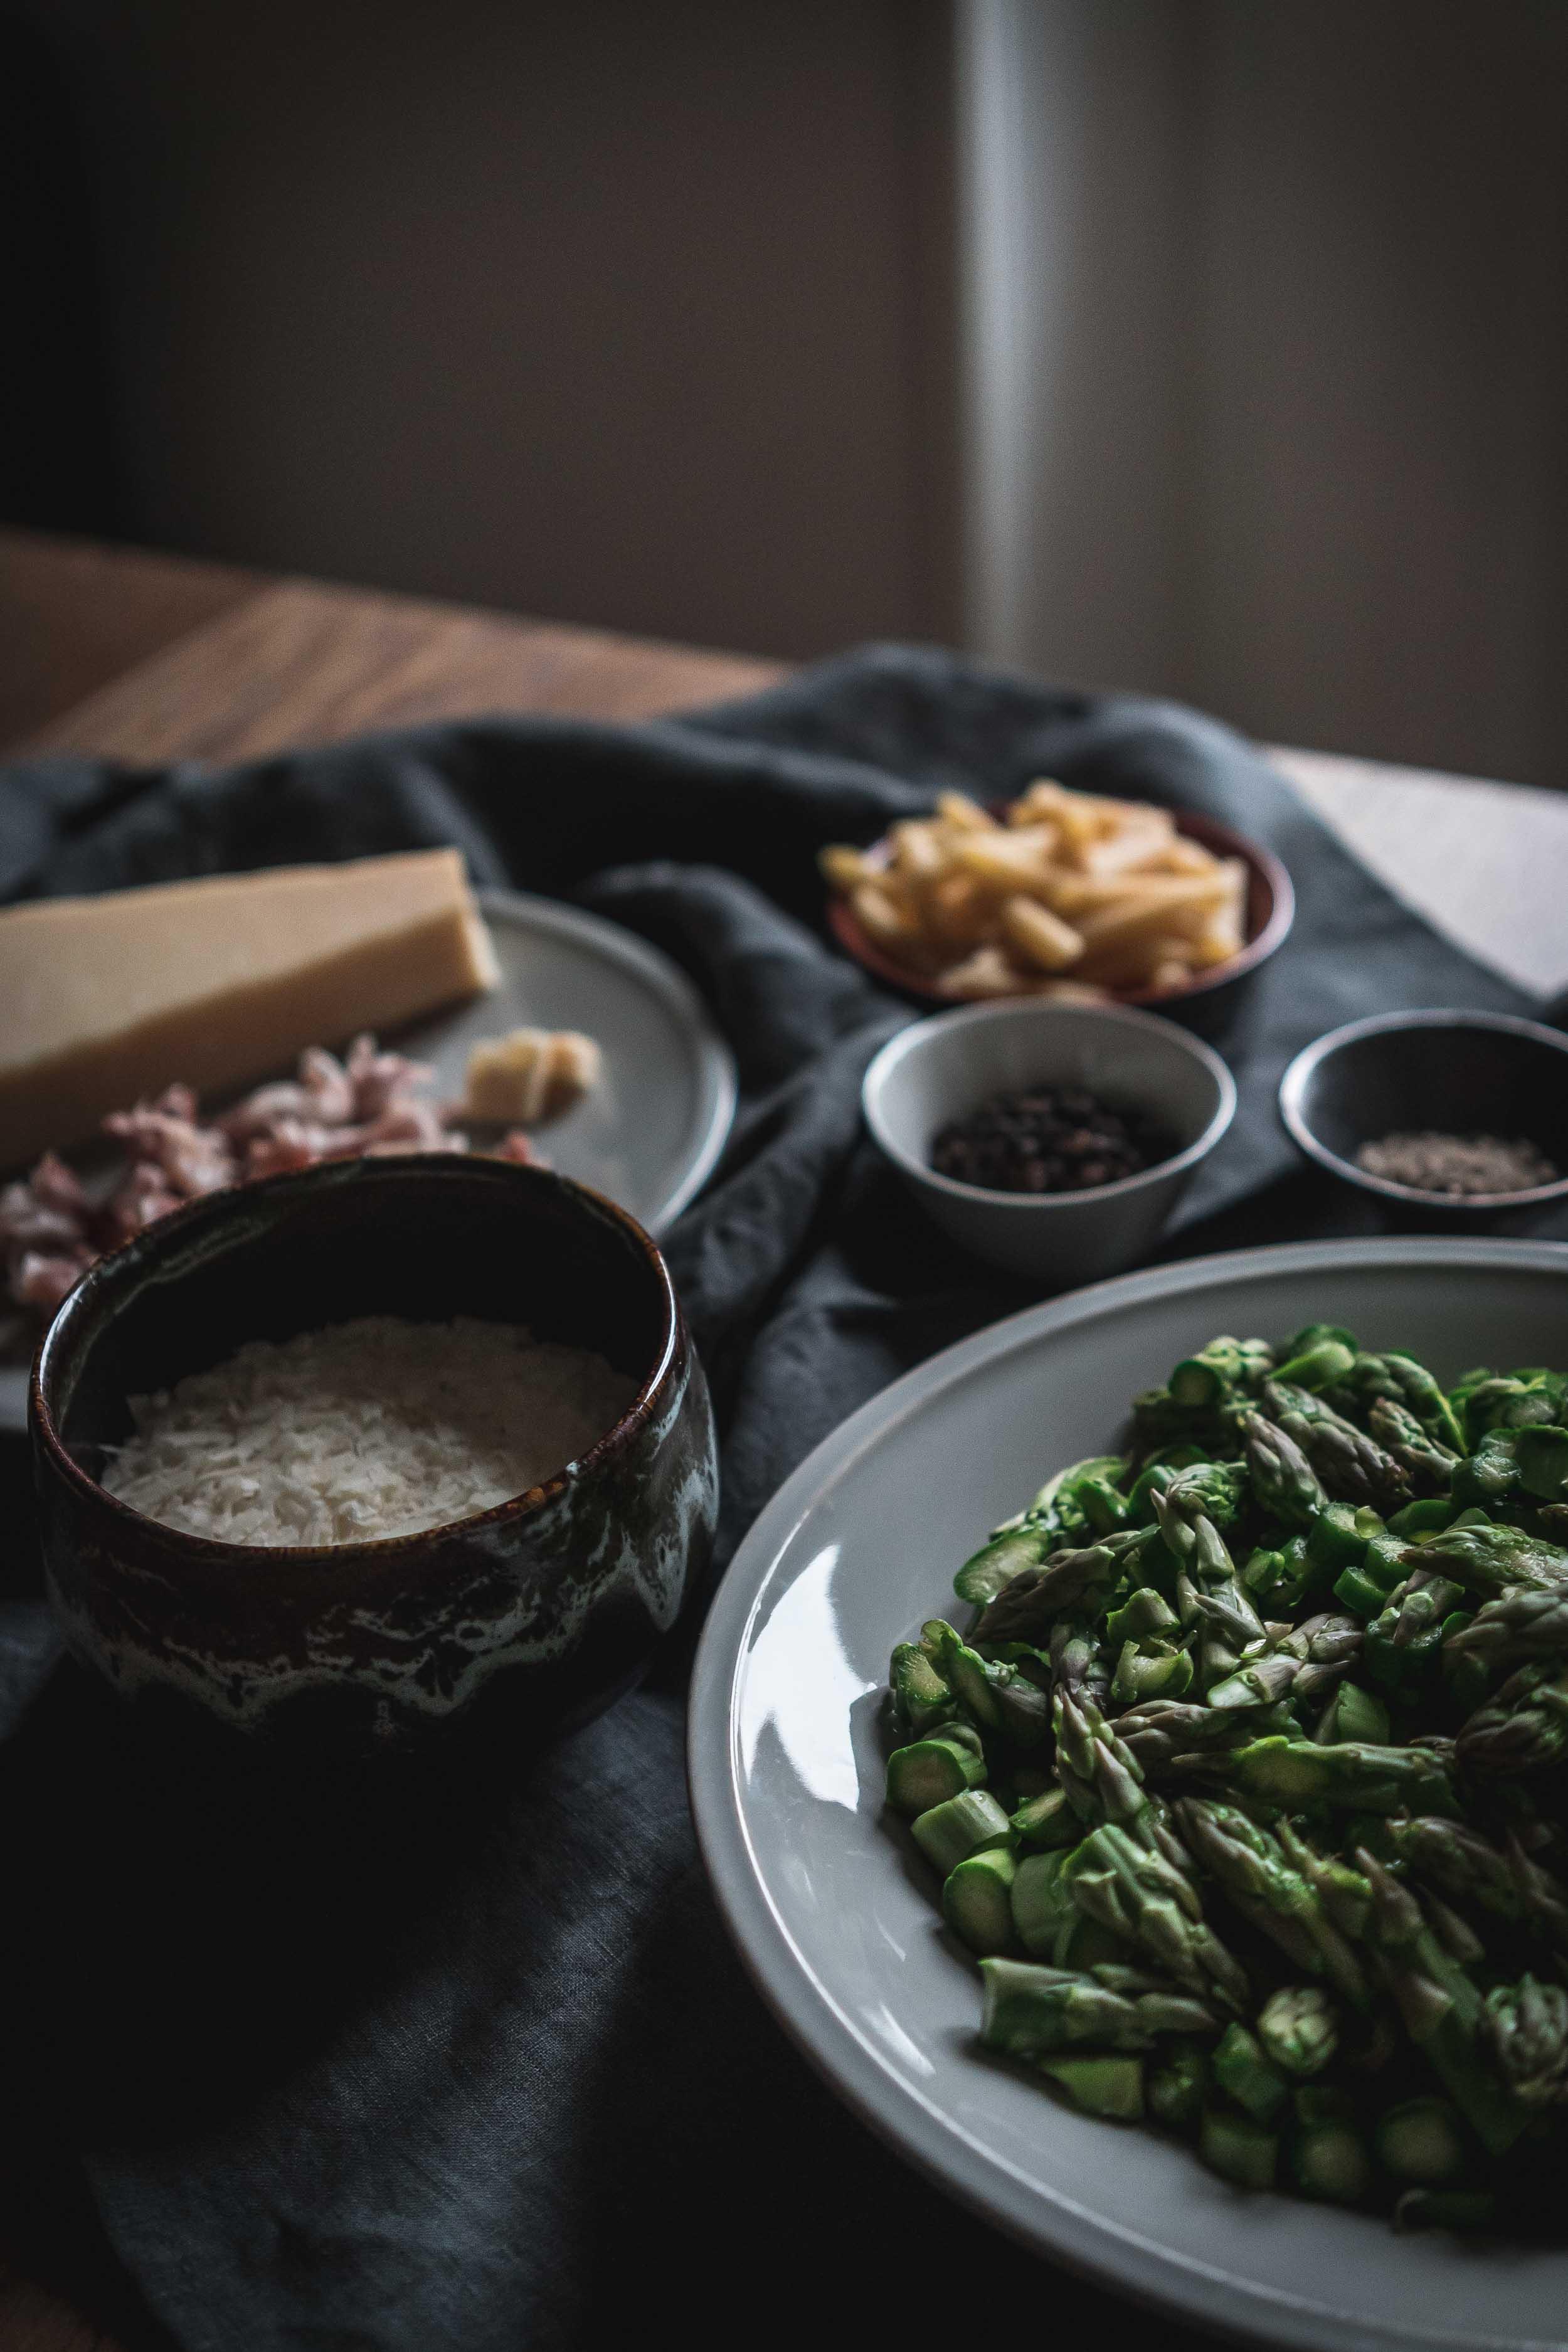 Asparagus-and-Bacon-Penne-Pasta-05111.jpg